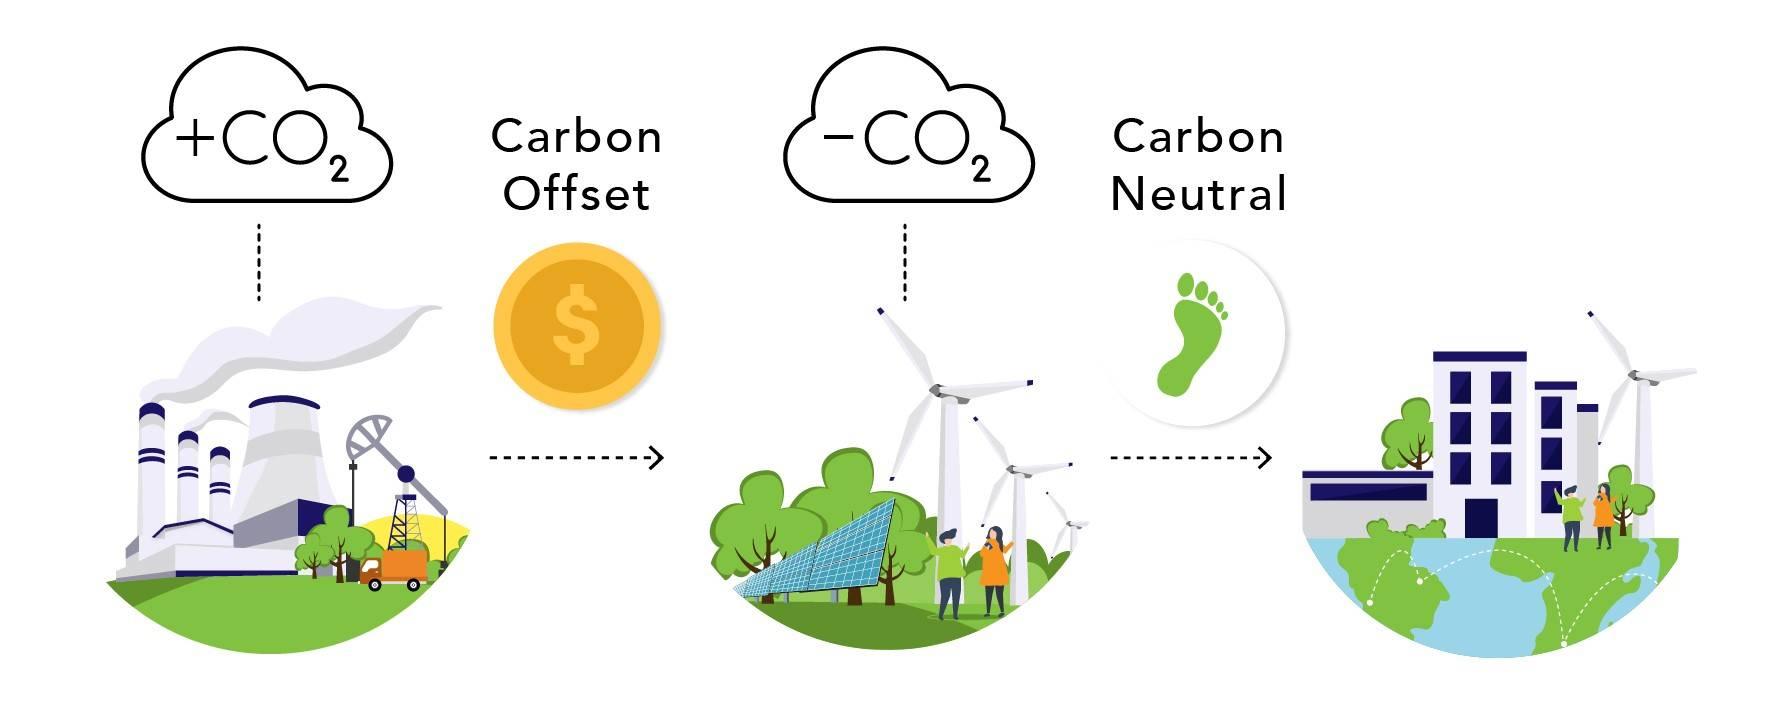 Basic diagram of carbon offsets